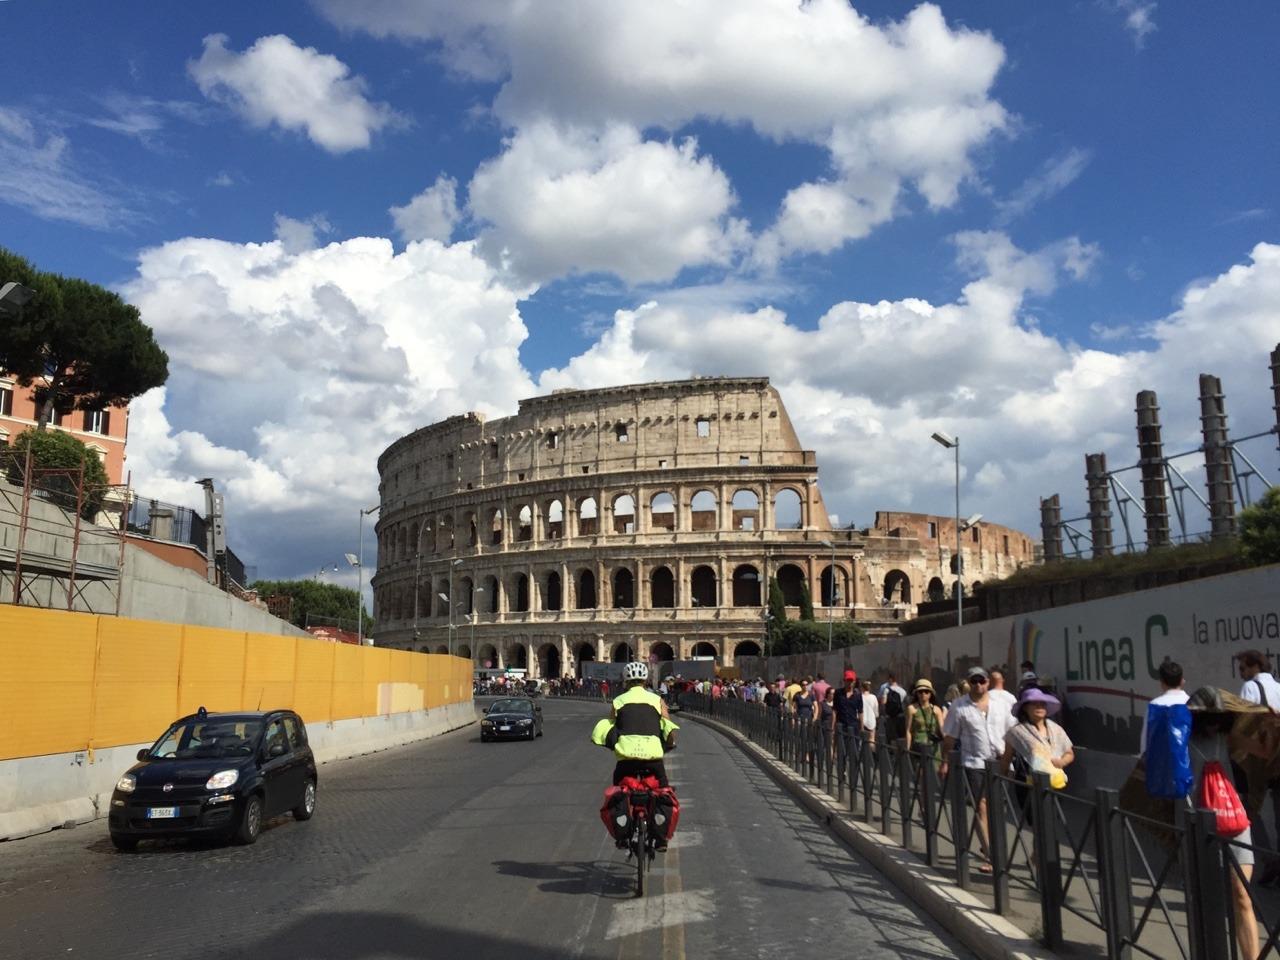 Riding towards the Colosseum!